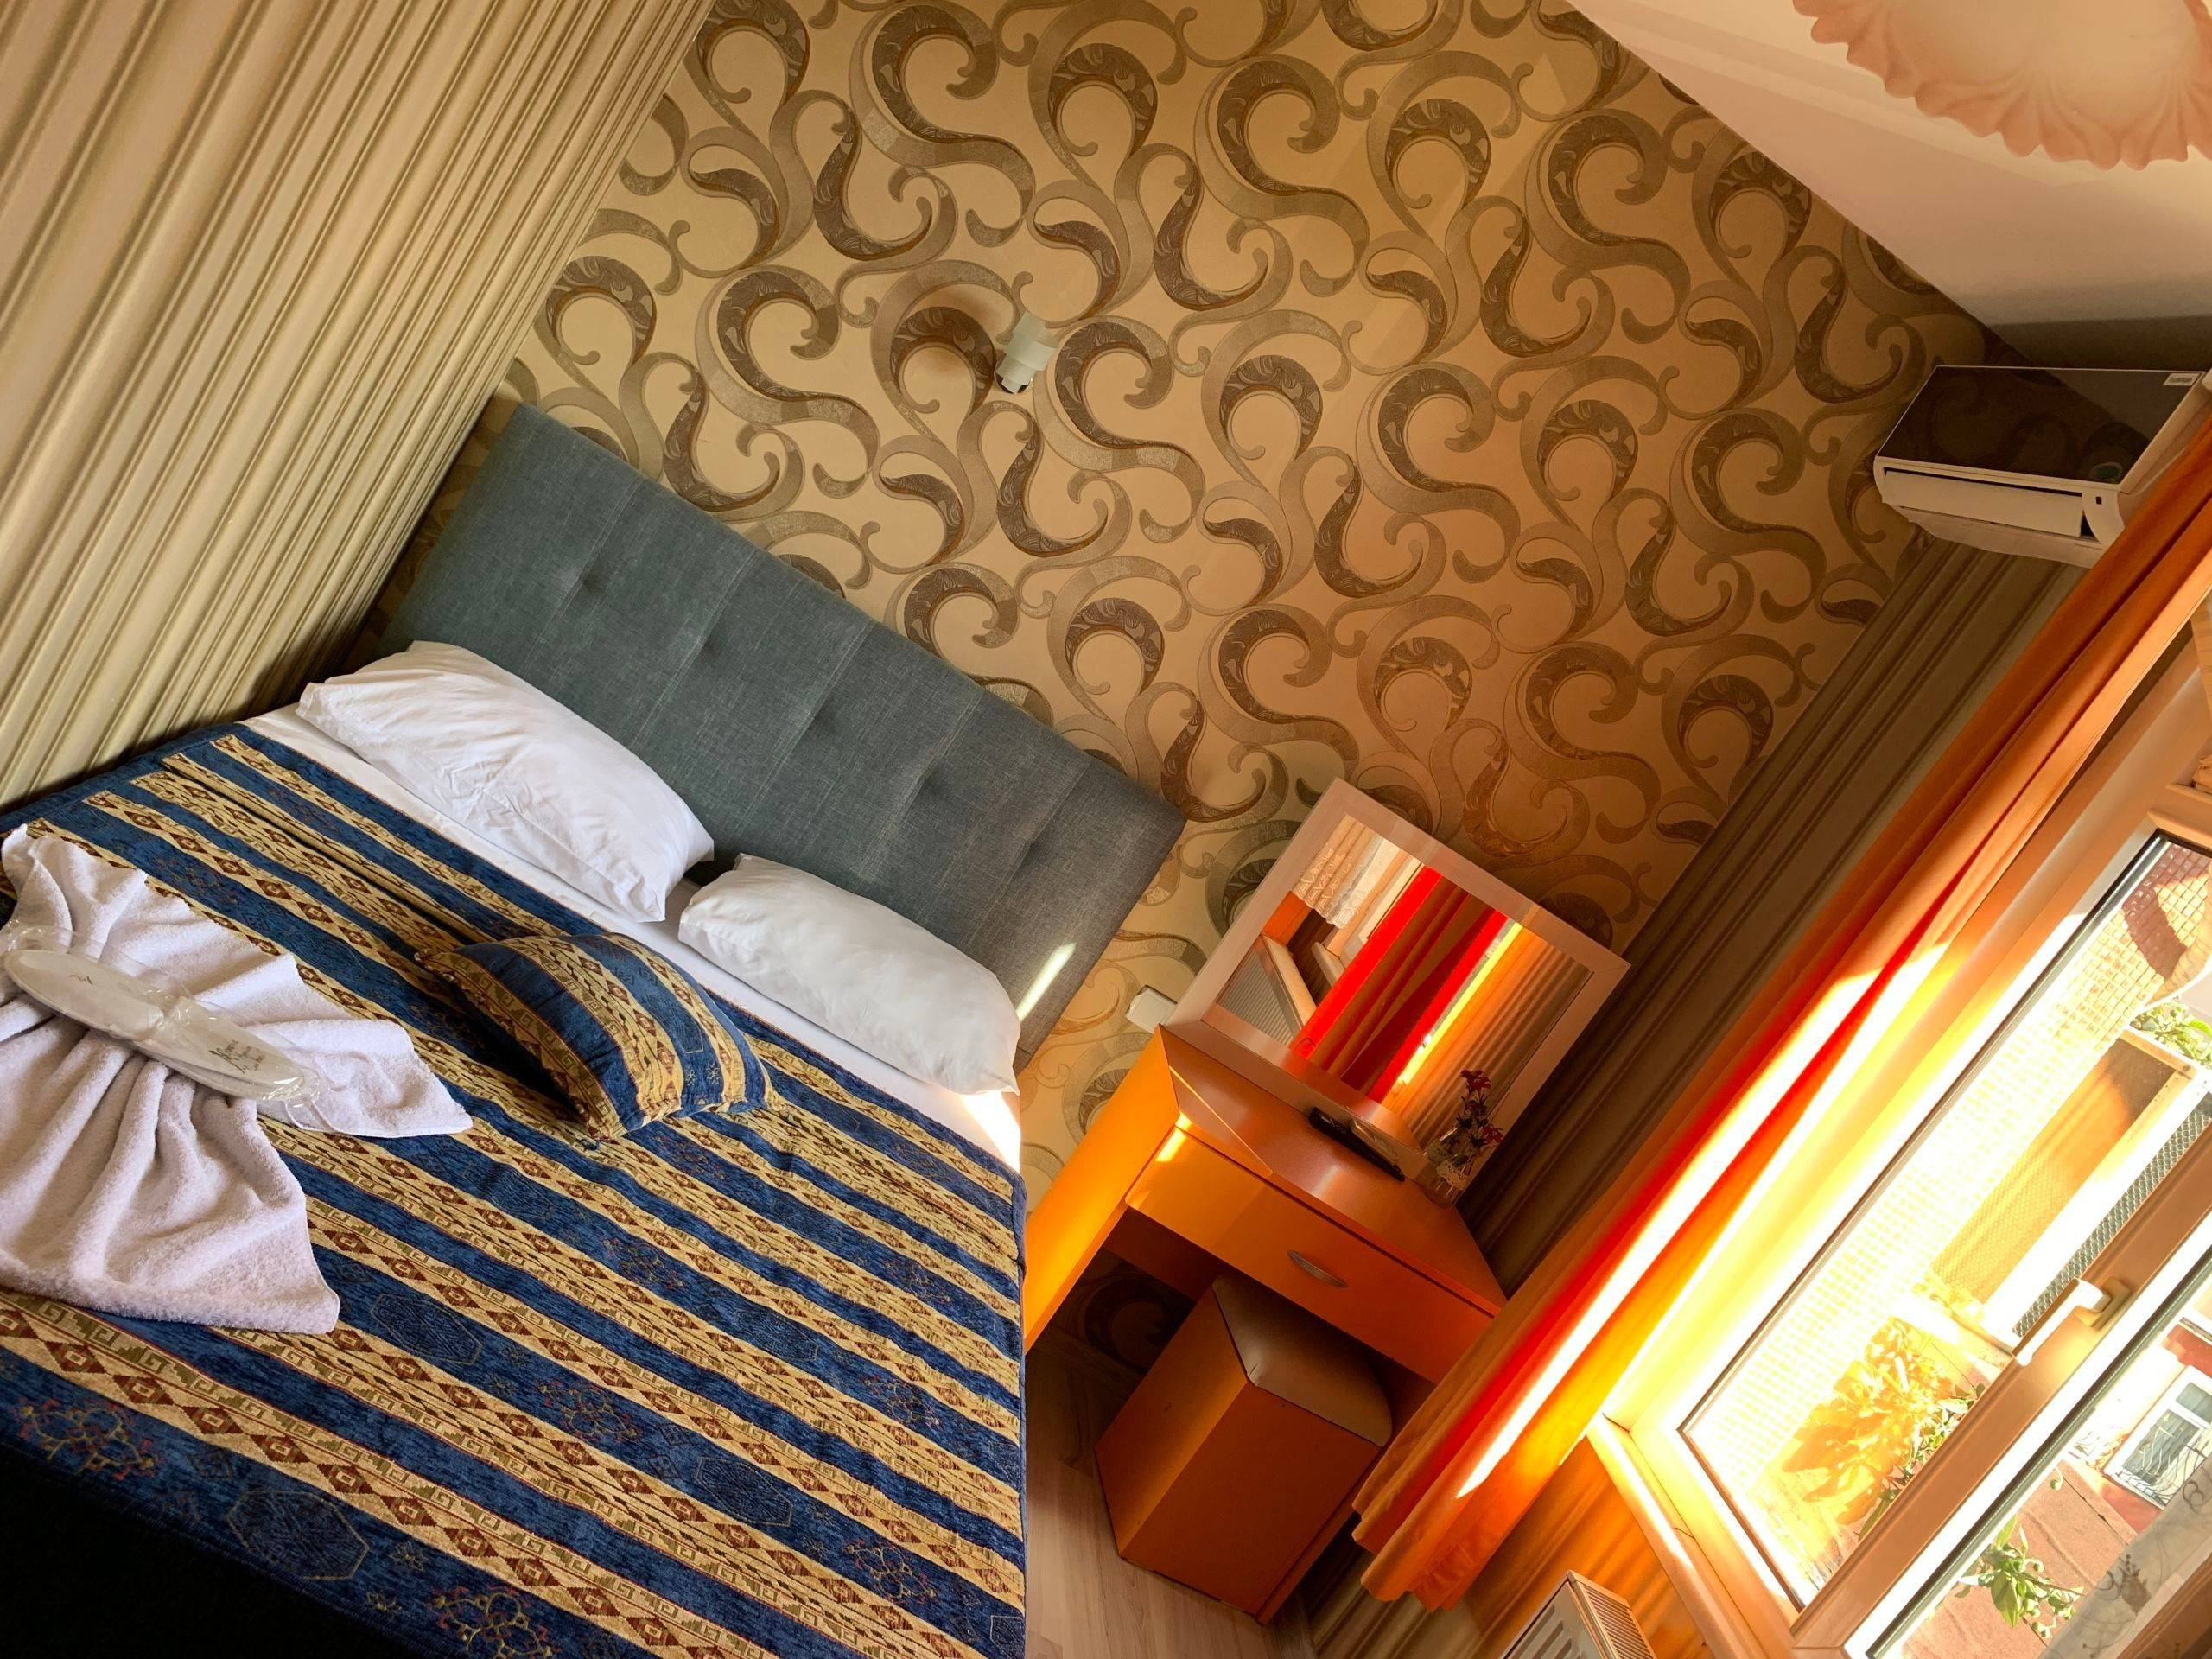 Anadolu Otel İstanbul, İstanbul, Sultanahmet, 33435